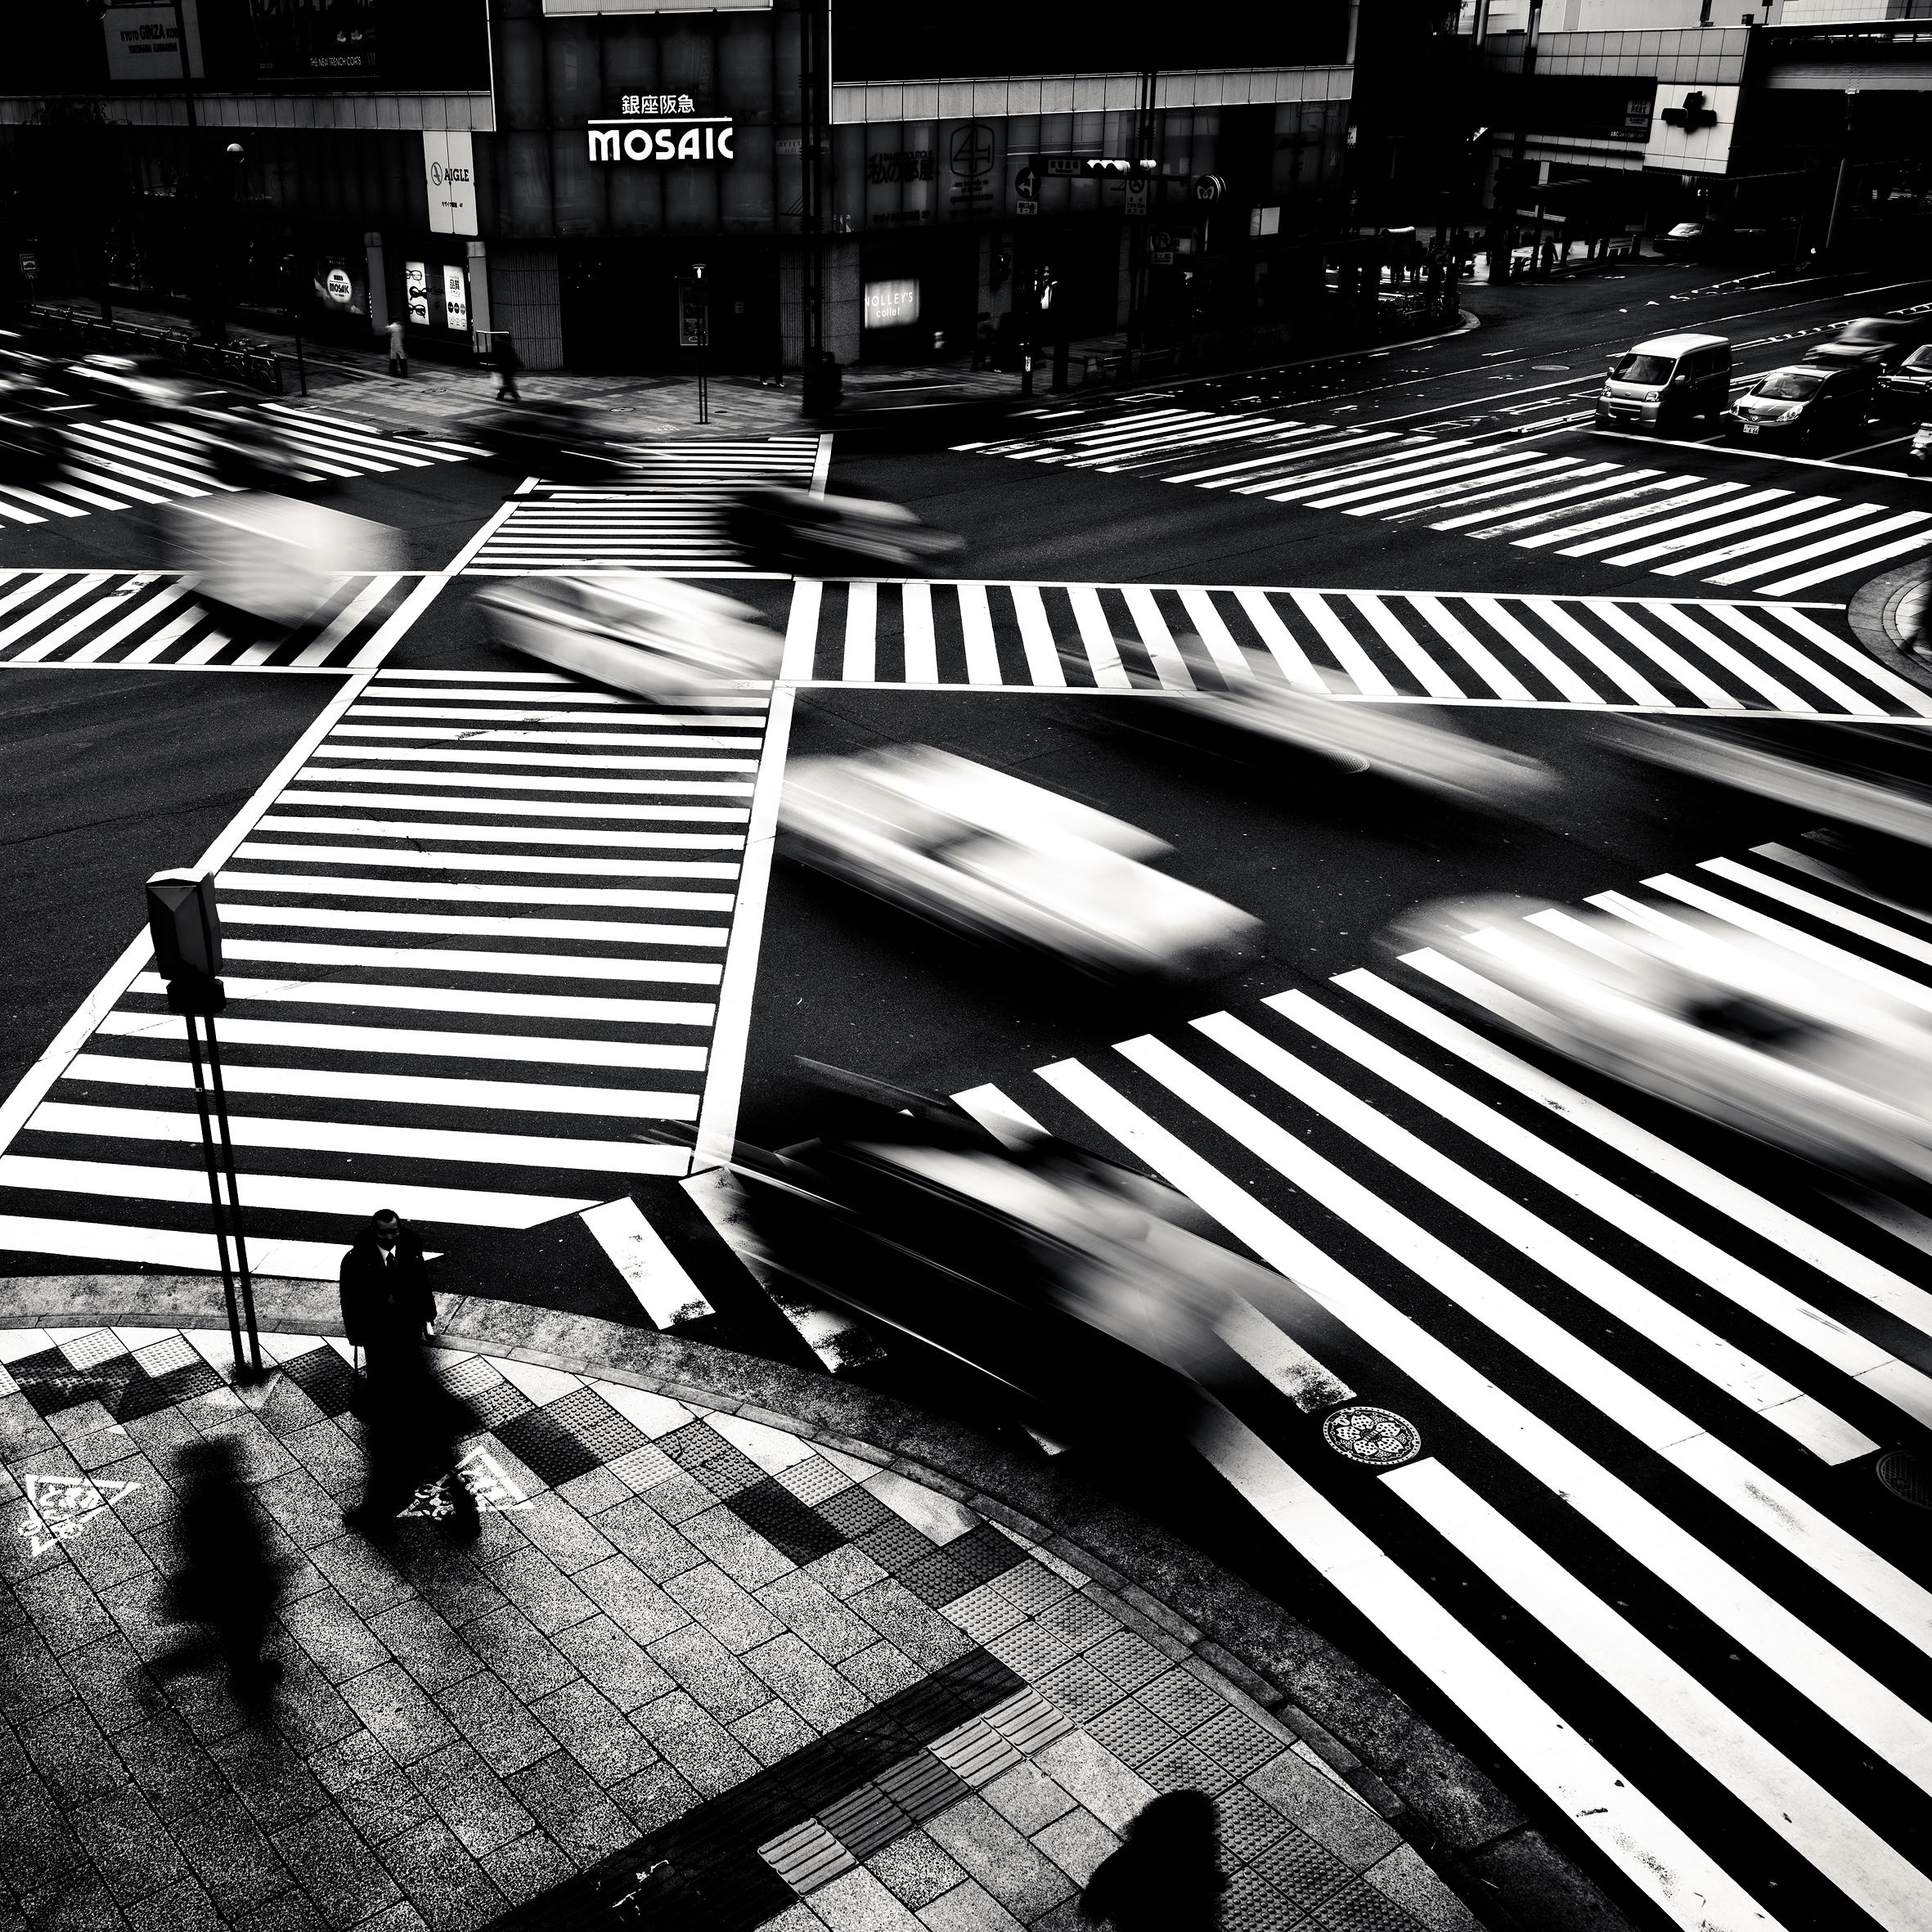 © Josef Hoflehner - Retrospective 1975-2015, to be published by teNeues in September 2015, www.teneues.com. Ginza, Tokyo, Japan, 2009, Photo © 2015 Josef Hoflehner. All rights reserved.